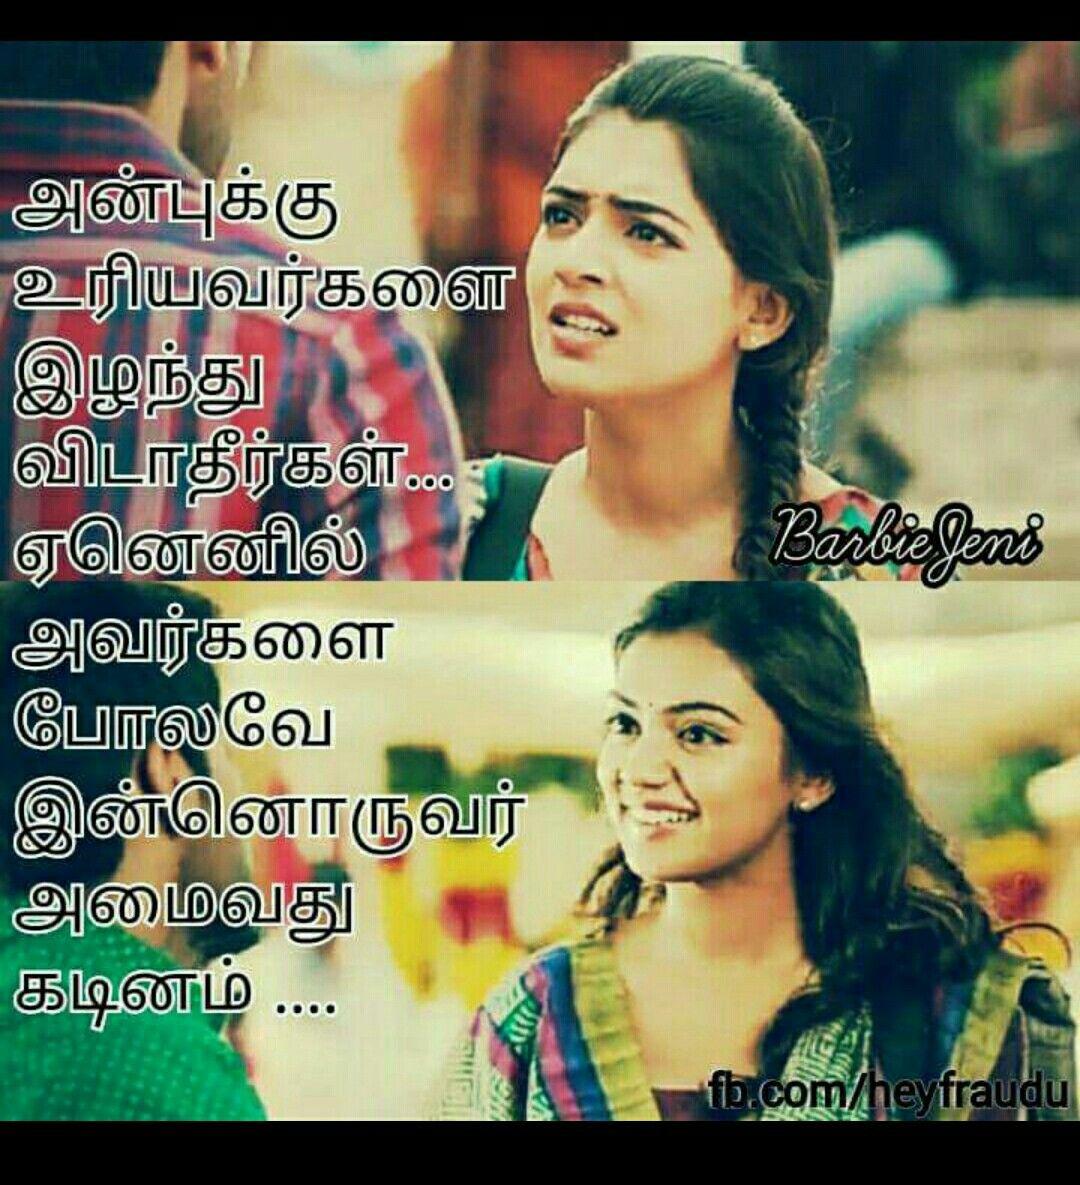 tamil edy thathuvam images Funny Tamil Sms Kavithaigal Pinterest